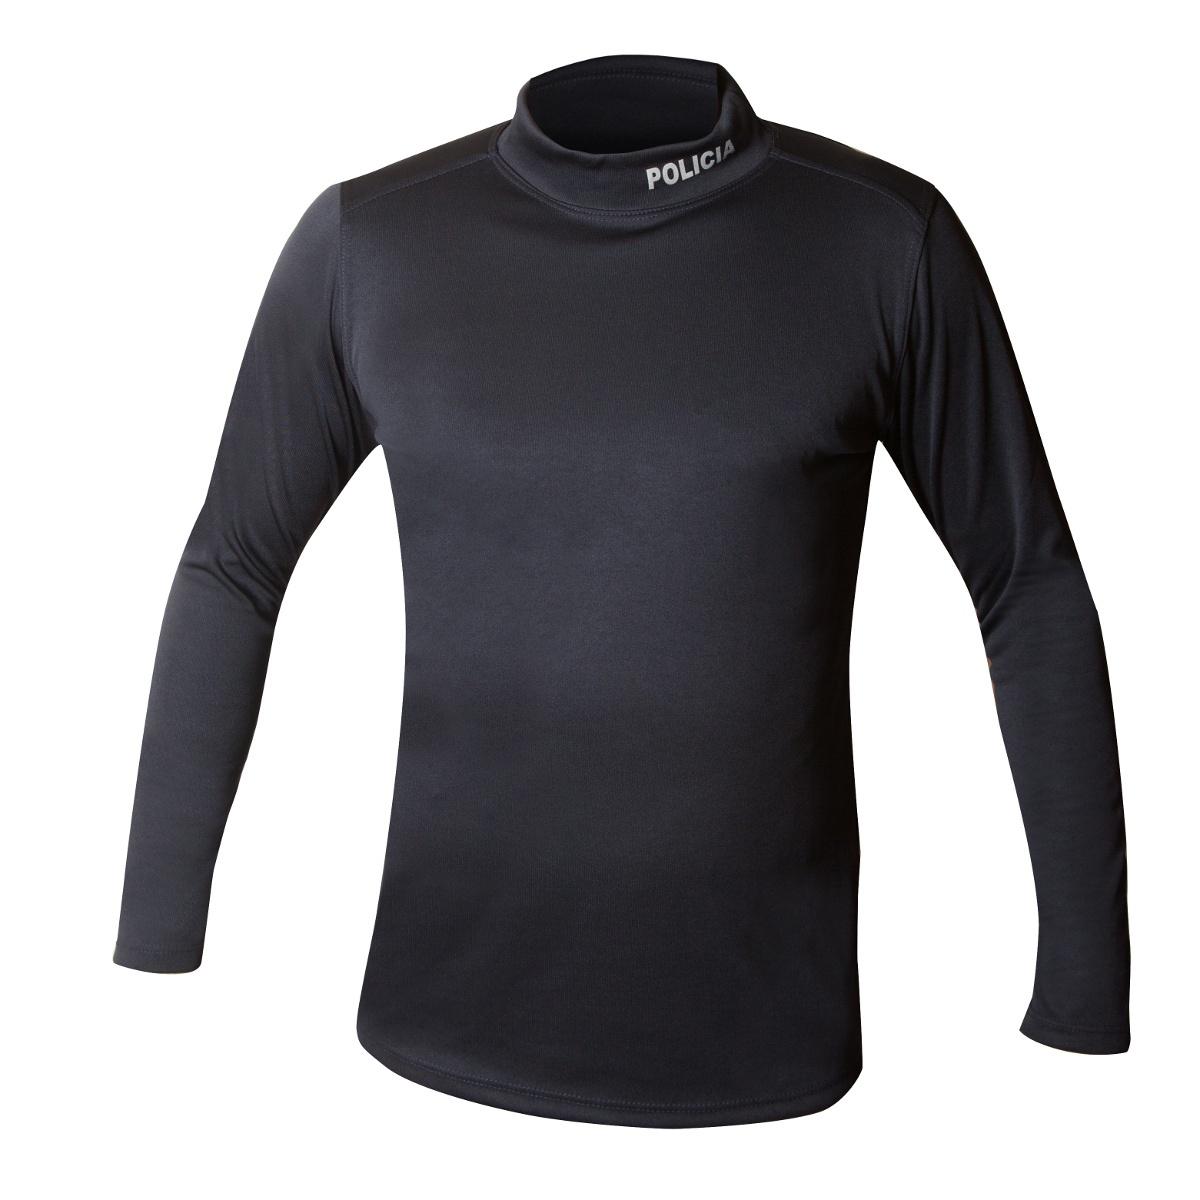 007P Camiseta COOLMAX ALL SEASON